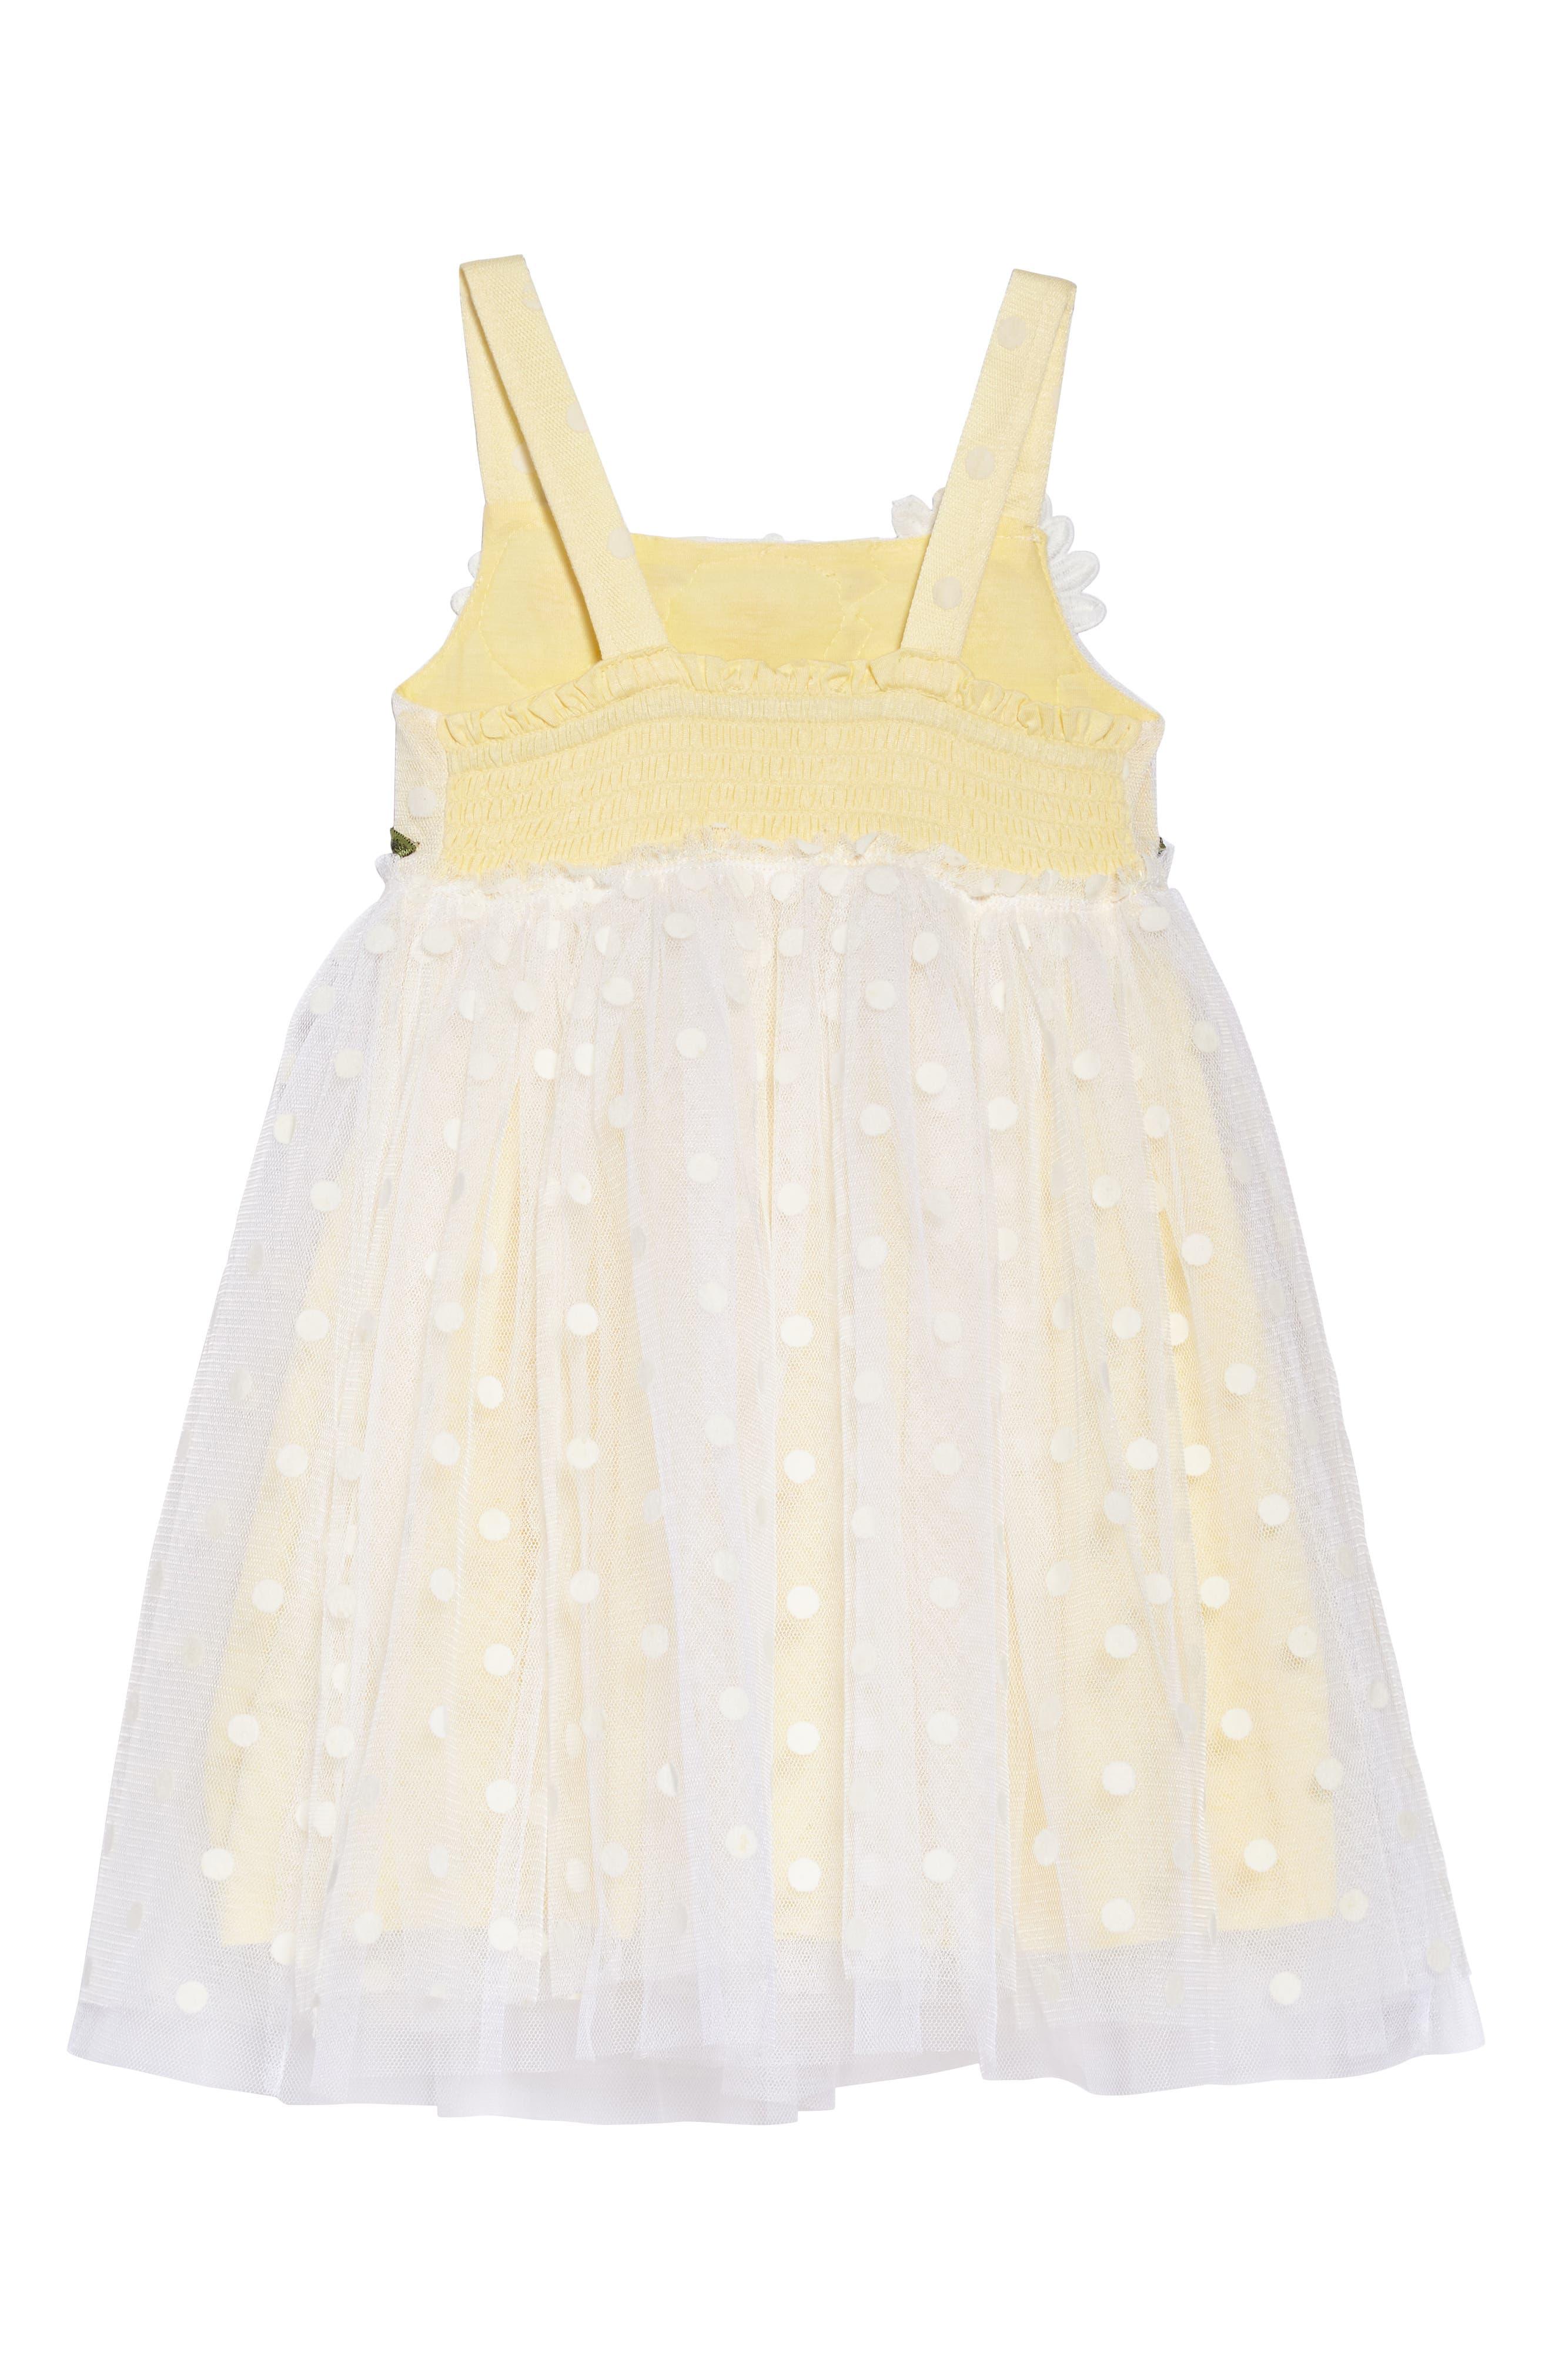 Polka Dot Dress,                             Alternate thumbnail 4, color,                             183